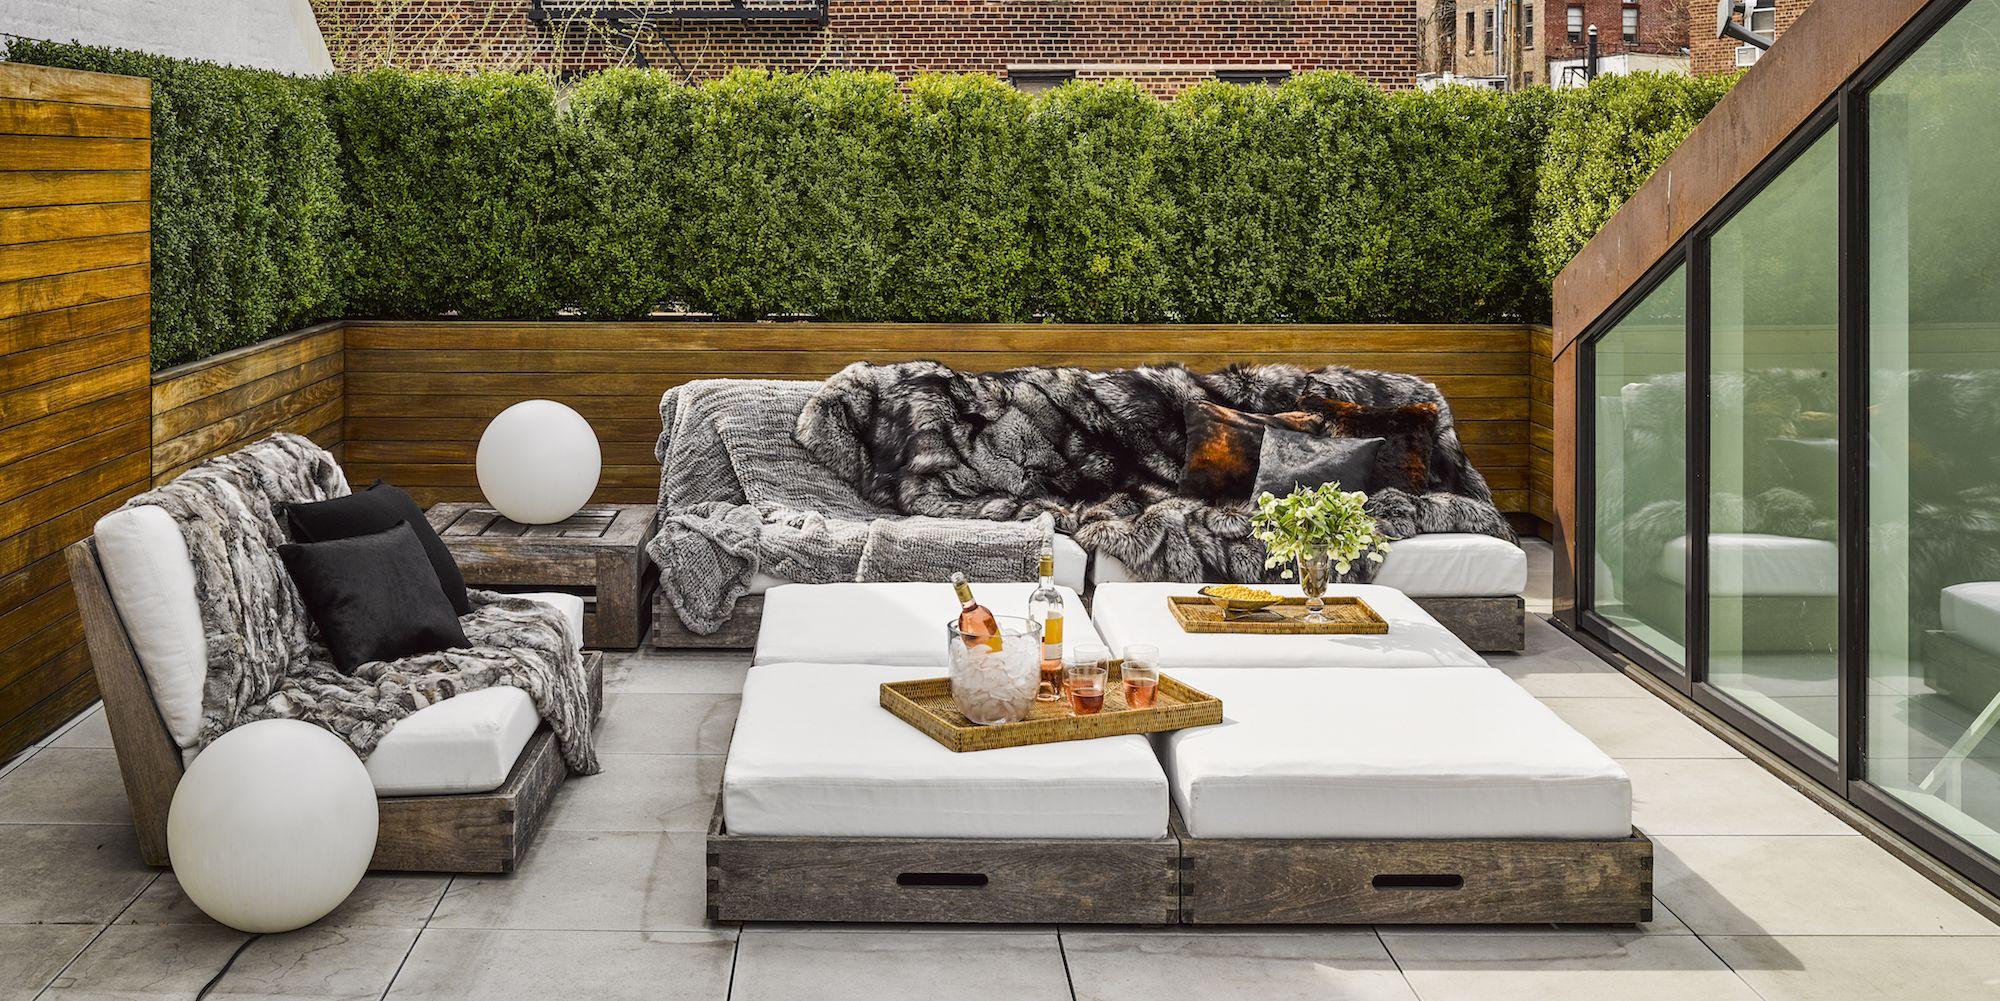 Backyard Patio Designs Ideas 40 best small patio ideas - small patio furniture & design